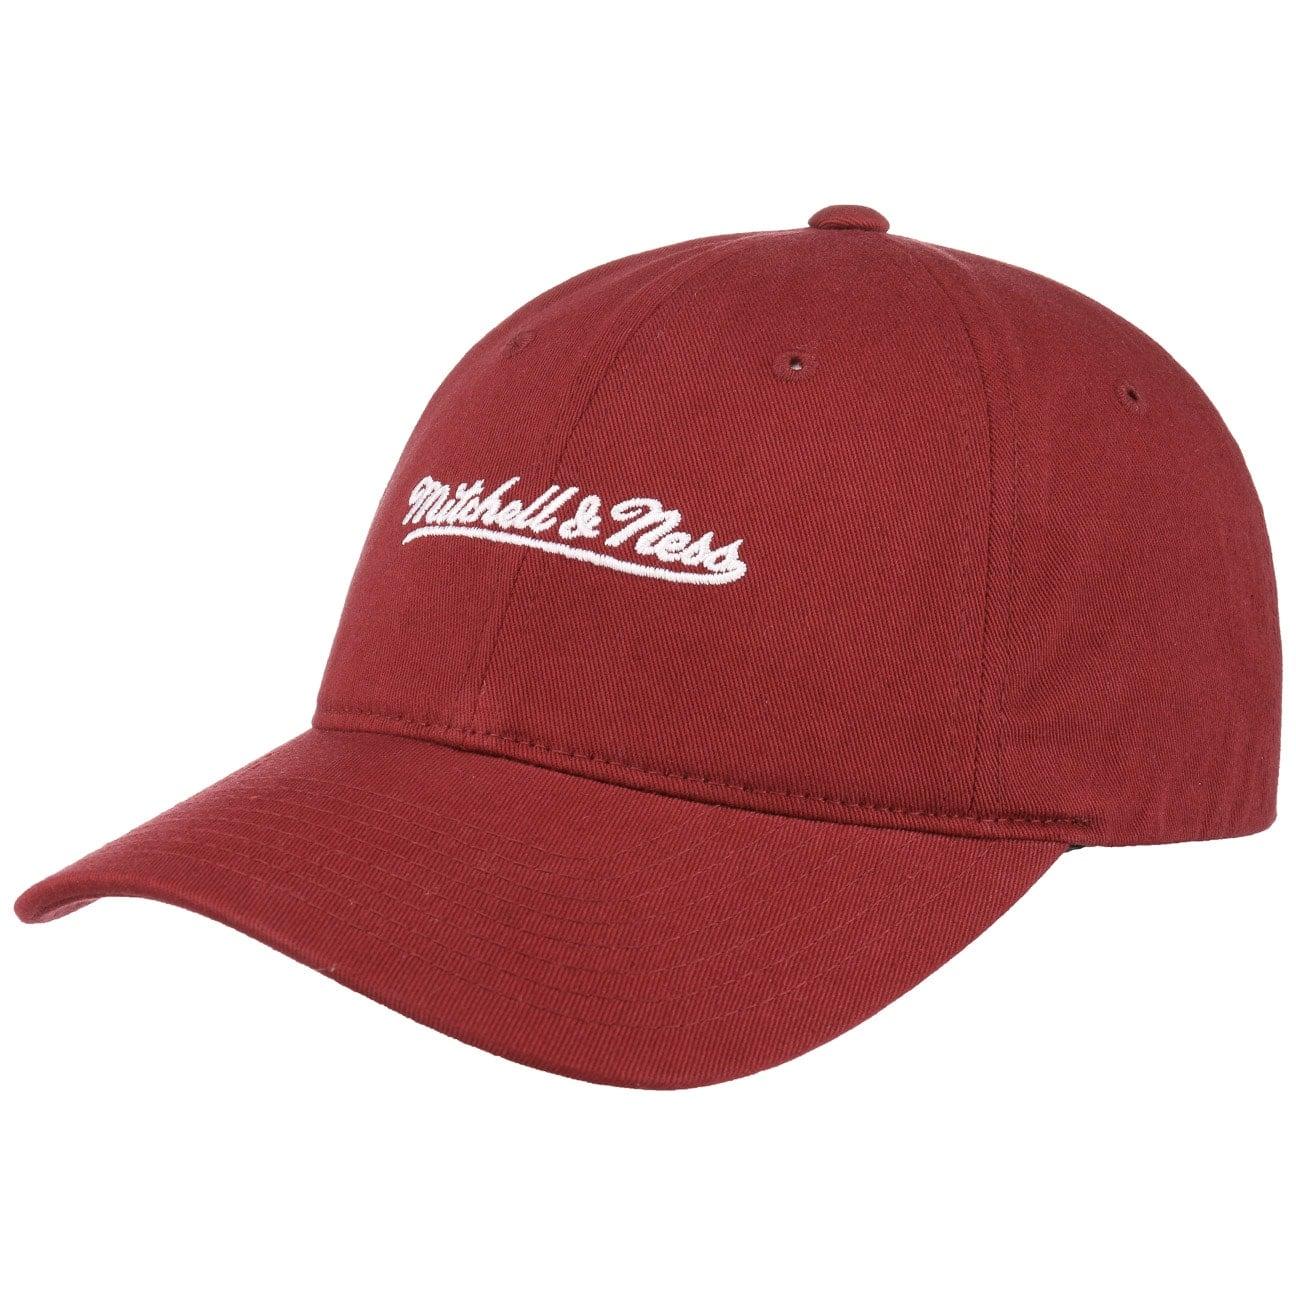 Gorra Chukker Own Brand by Mitchell & Ness  gorra de baseball